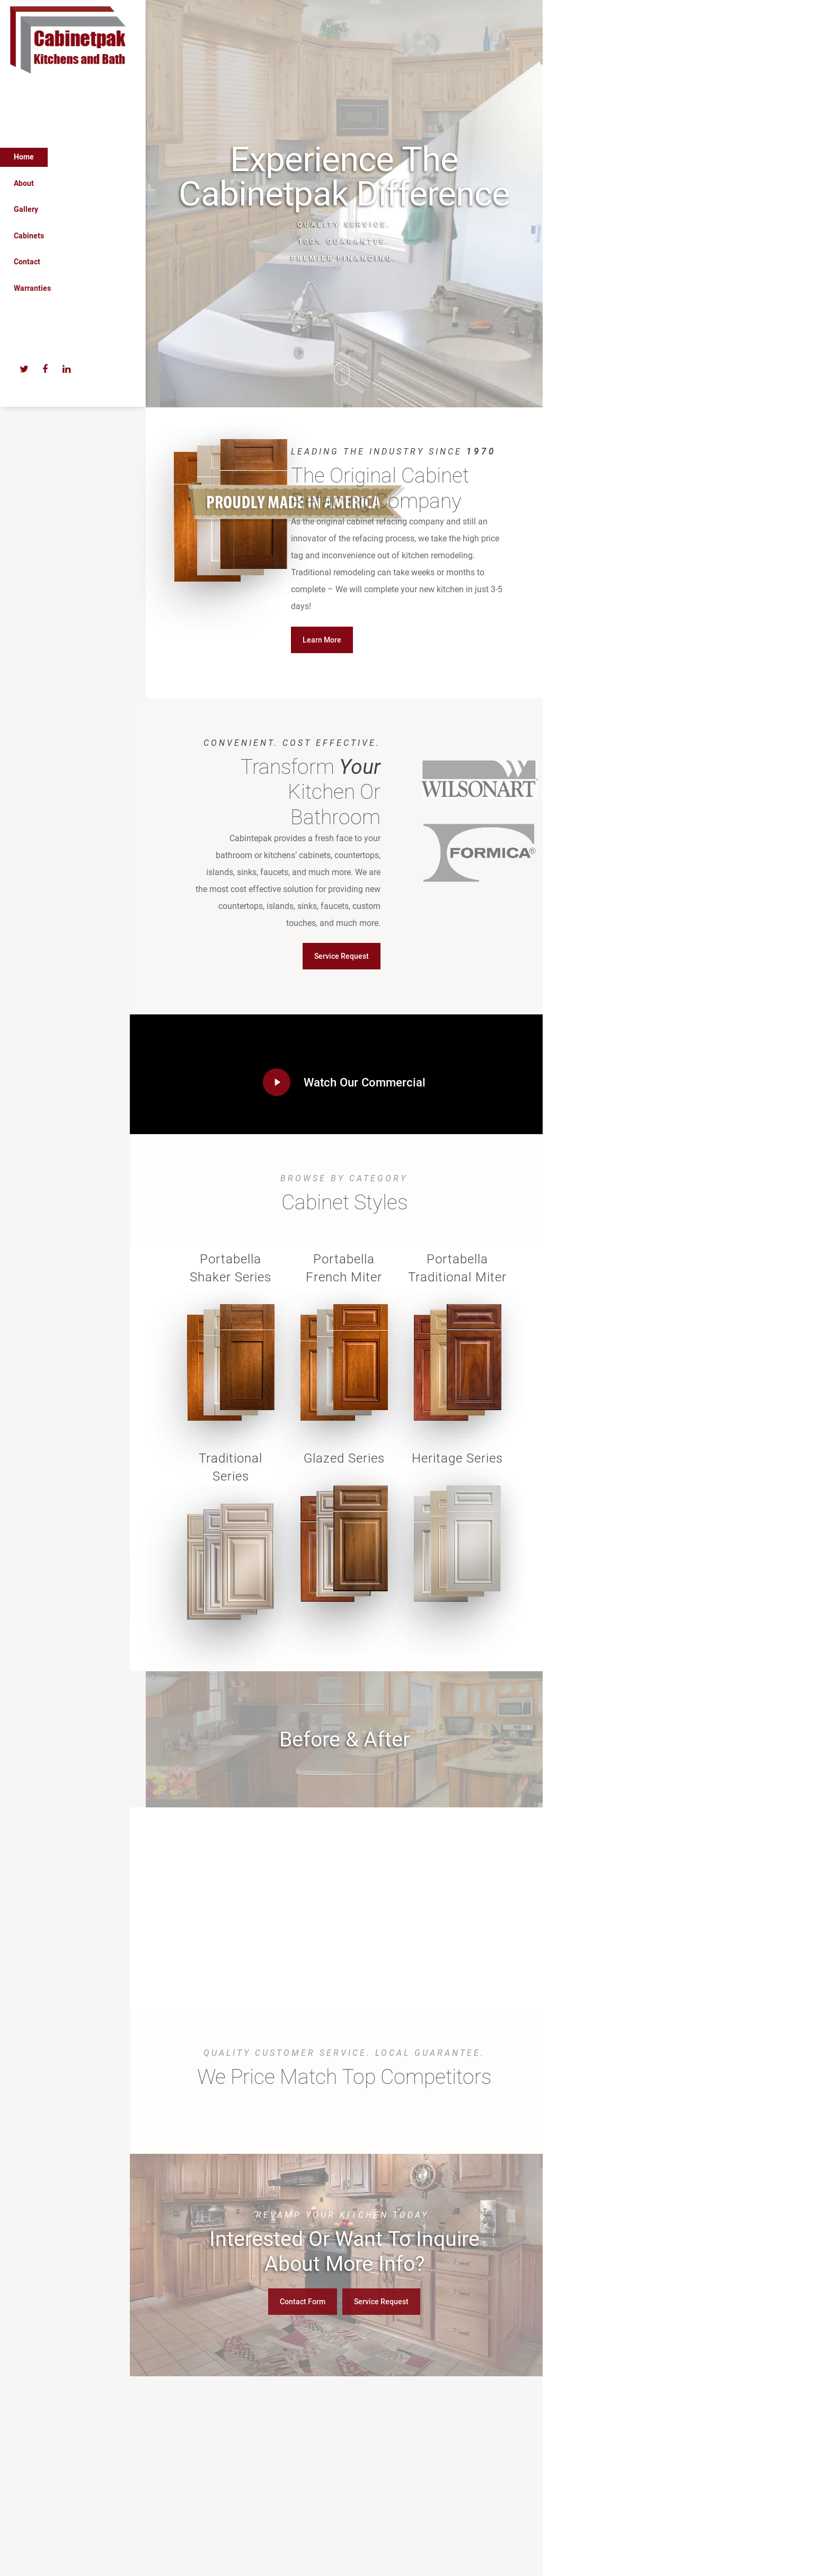 Genial CABINETPAK KITCHENS Website History